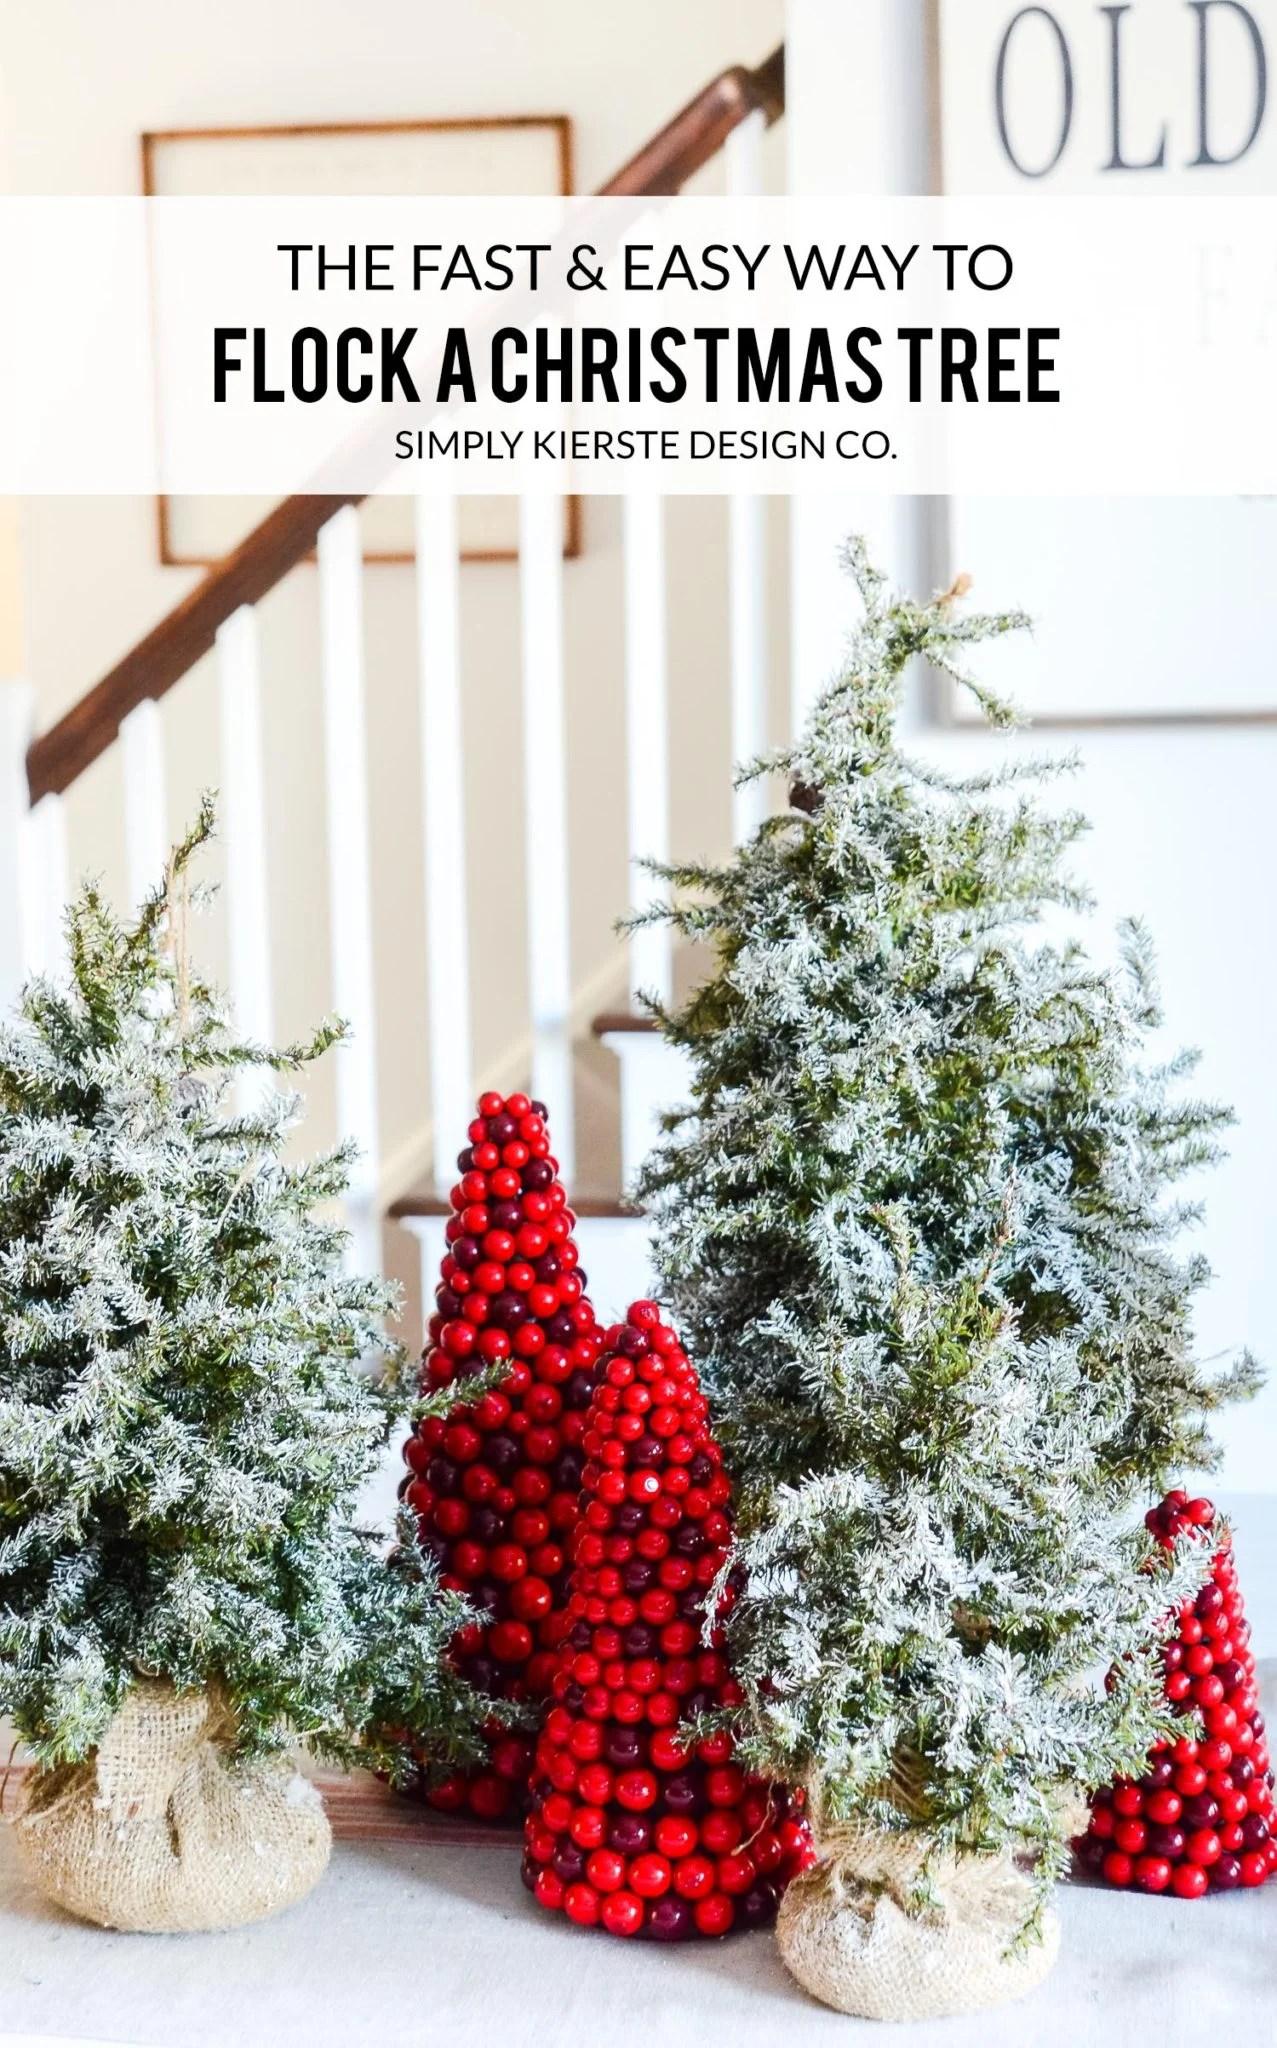 How to Flock a Christmas Tree the EASY way!   oldsaltfarm.com #diyflockedtree #flockedchristmastree #diychristmasdecor